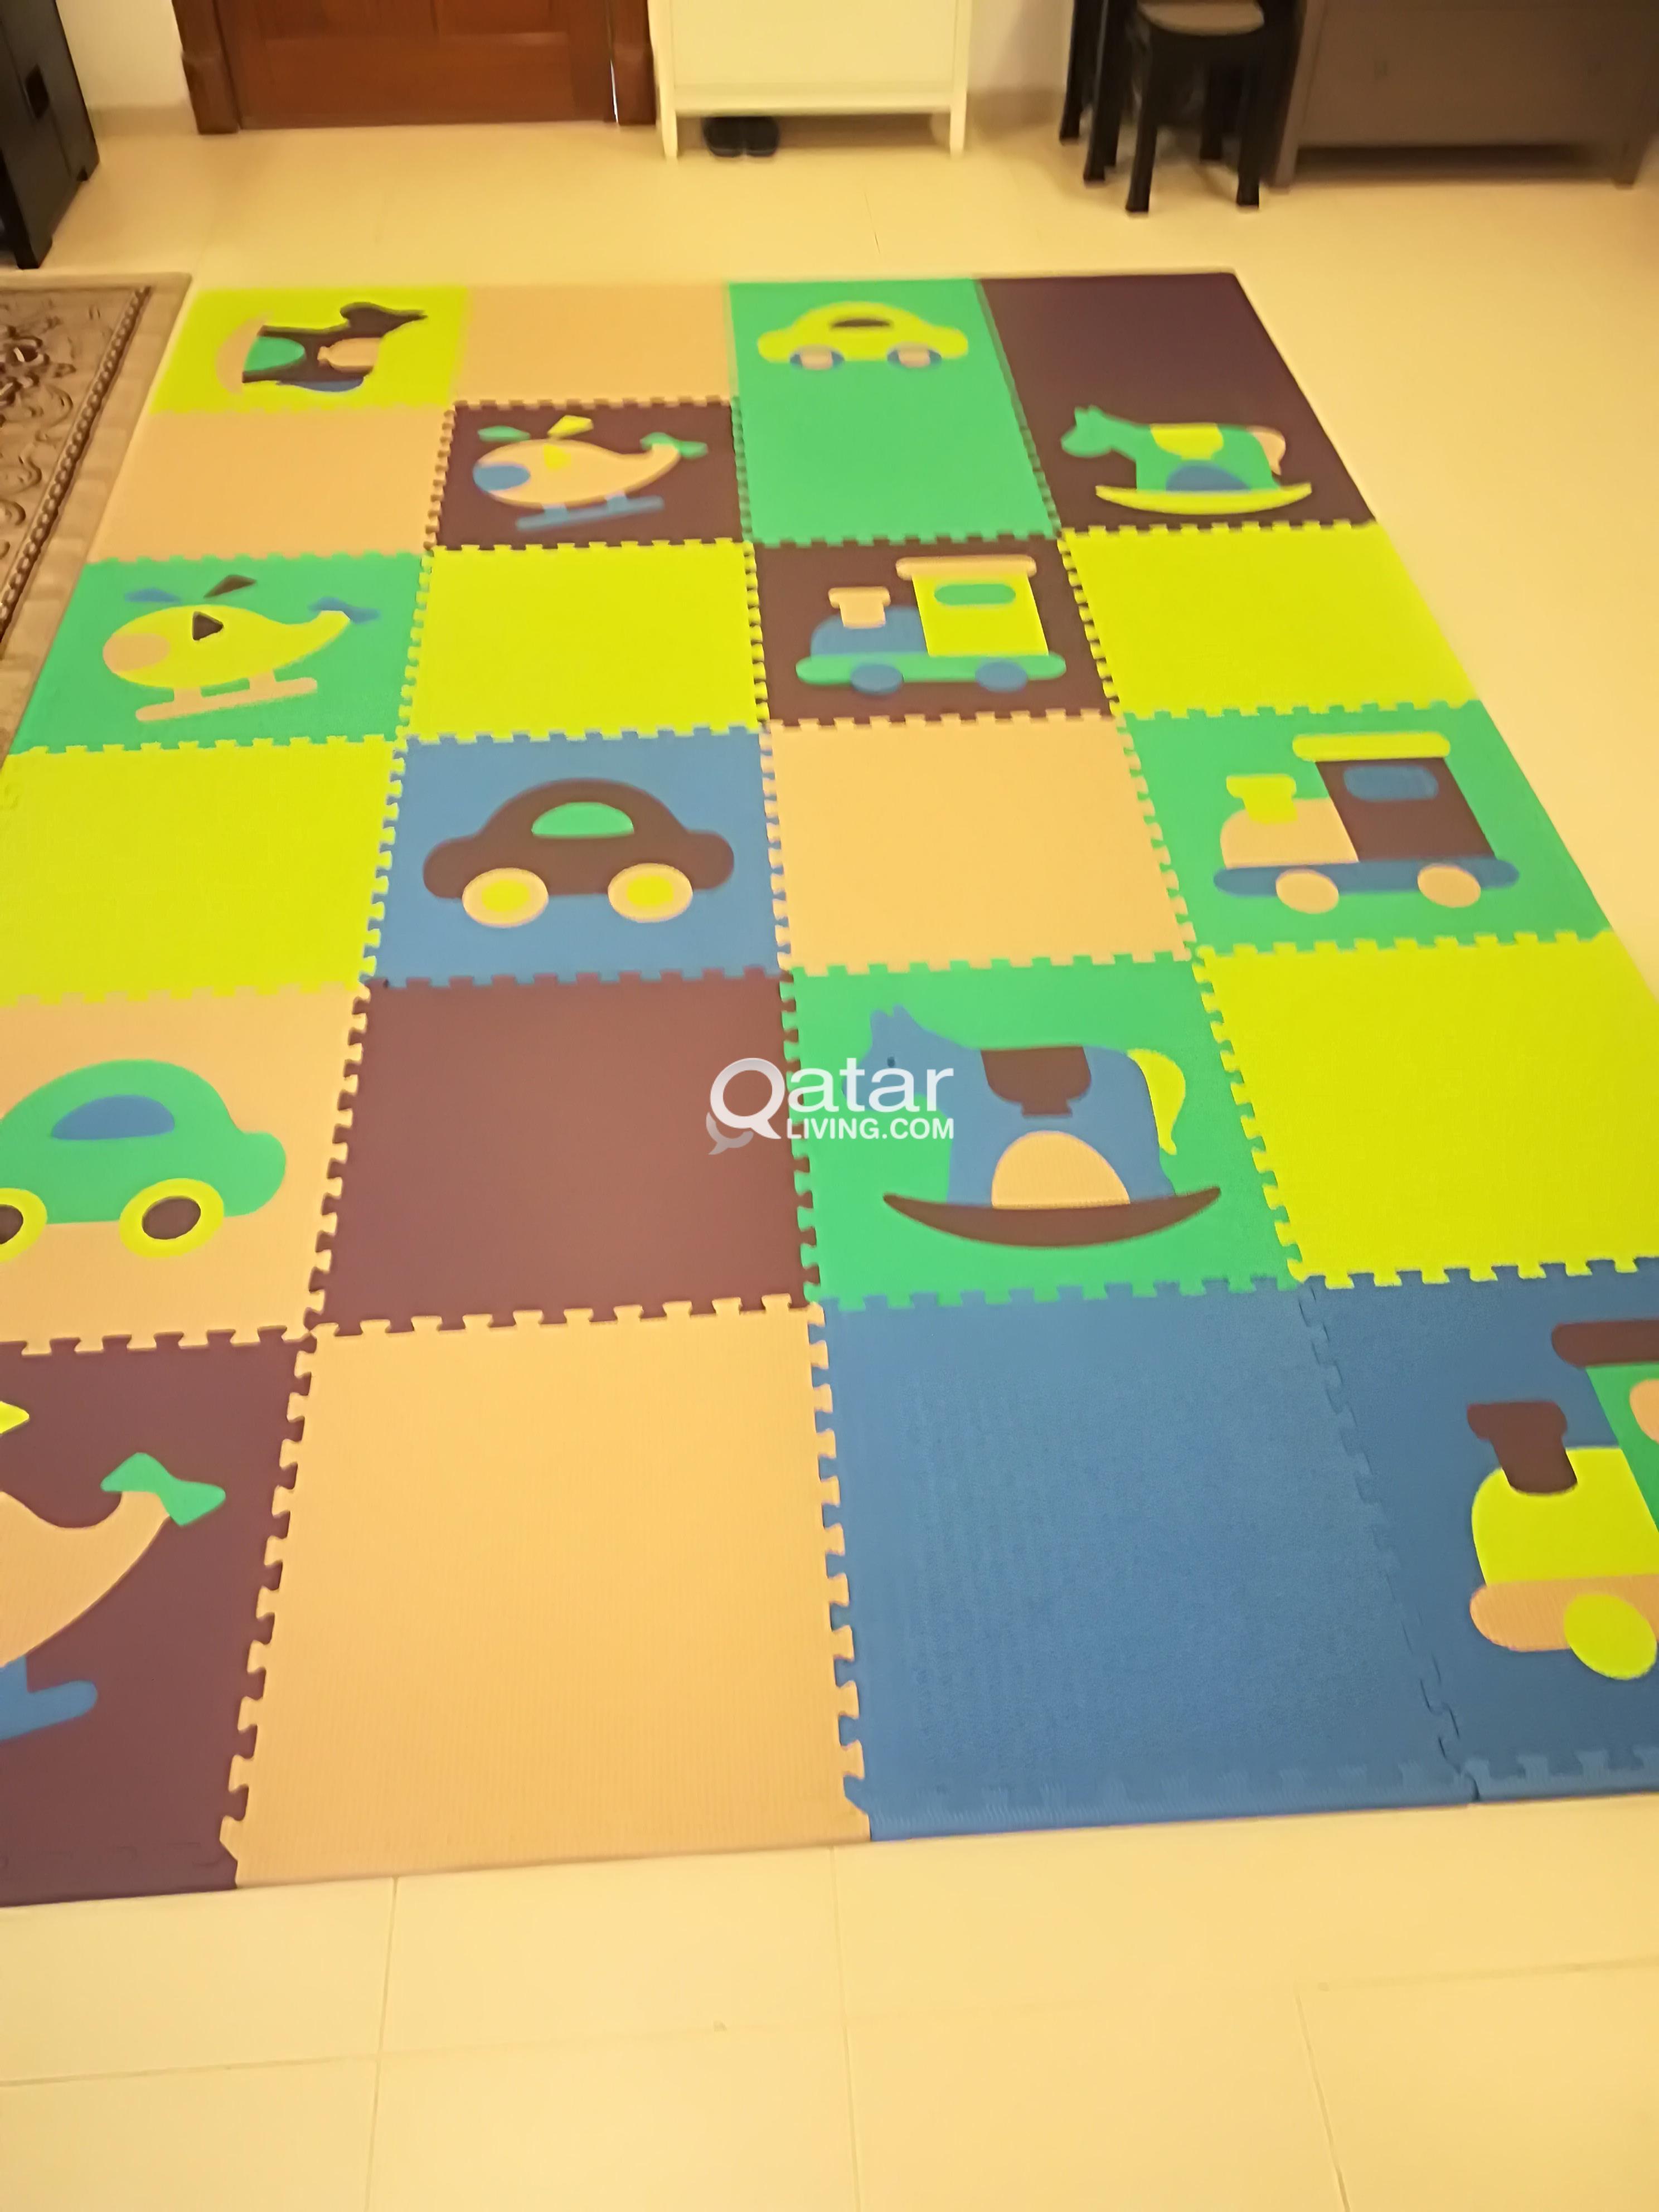 foam babies to shaggy mat pin floor carpet puzzle diy visit doormat mats jigsaw buy colorful yazi eva for